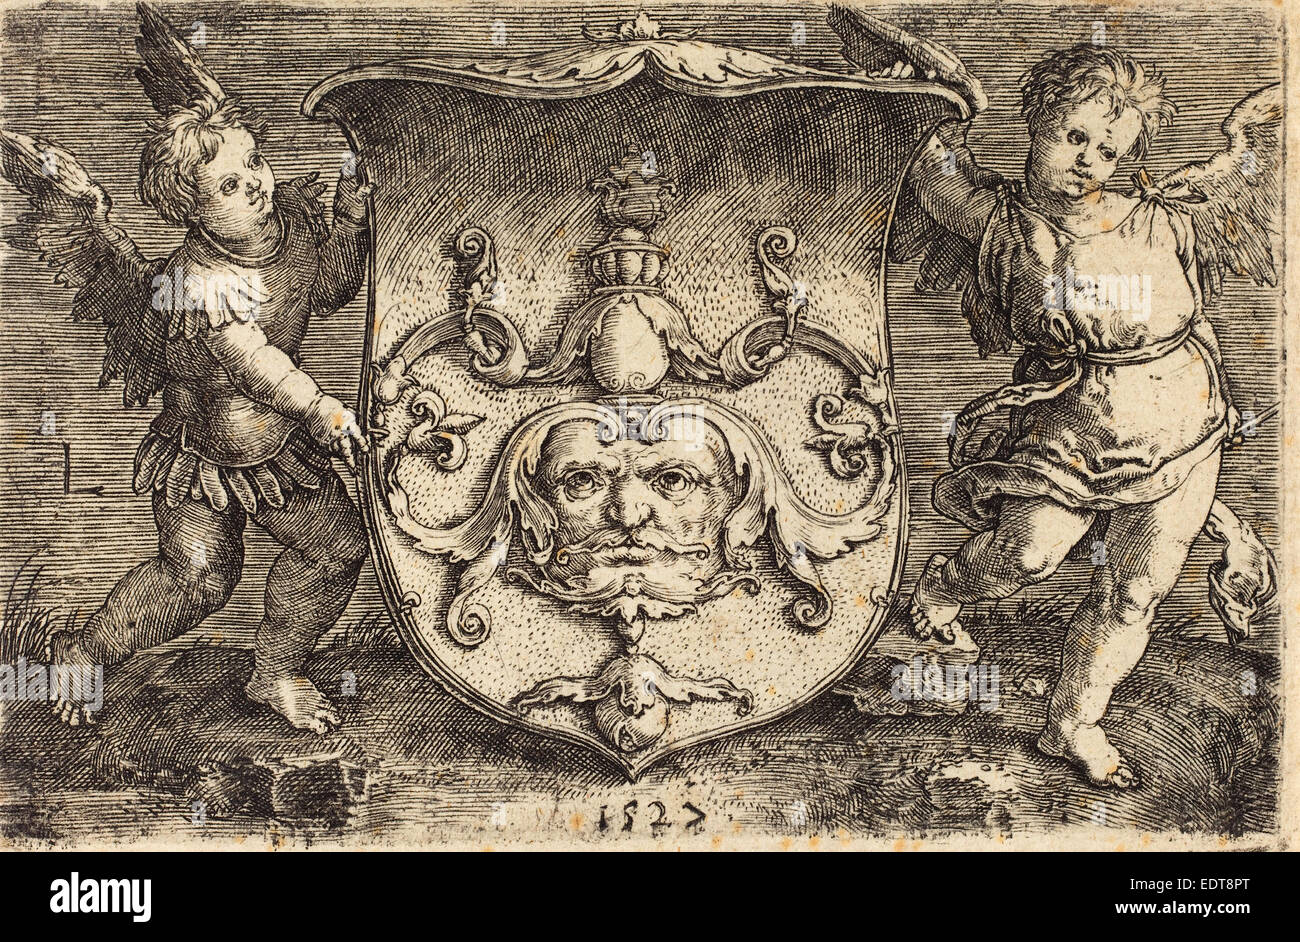 Ludwig Krug (German, c. 1488 - 1532), Shield with Mascaron, engraving - Stock Image